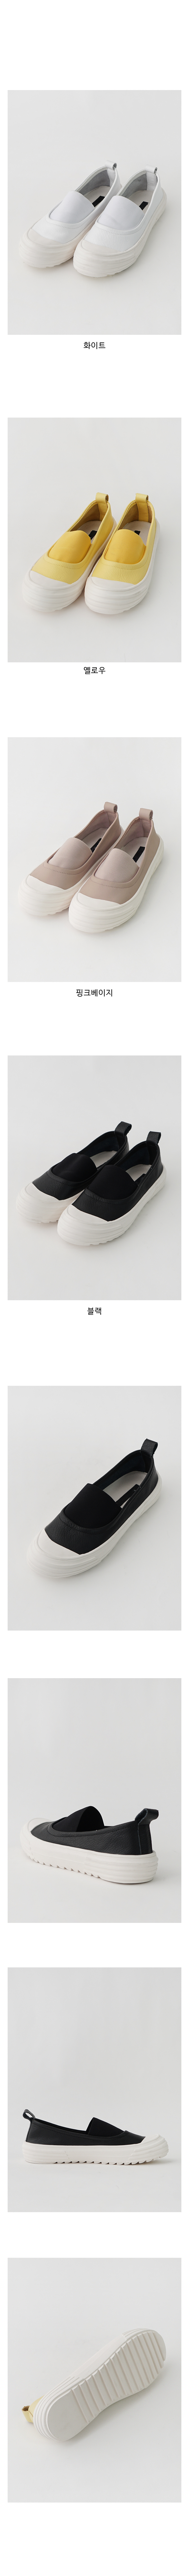 cutie pie banding leather shoes